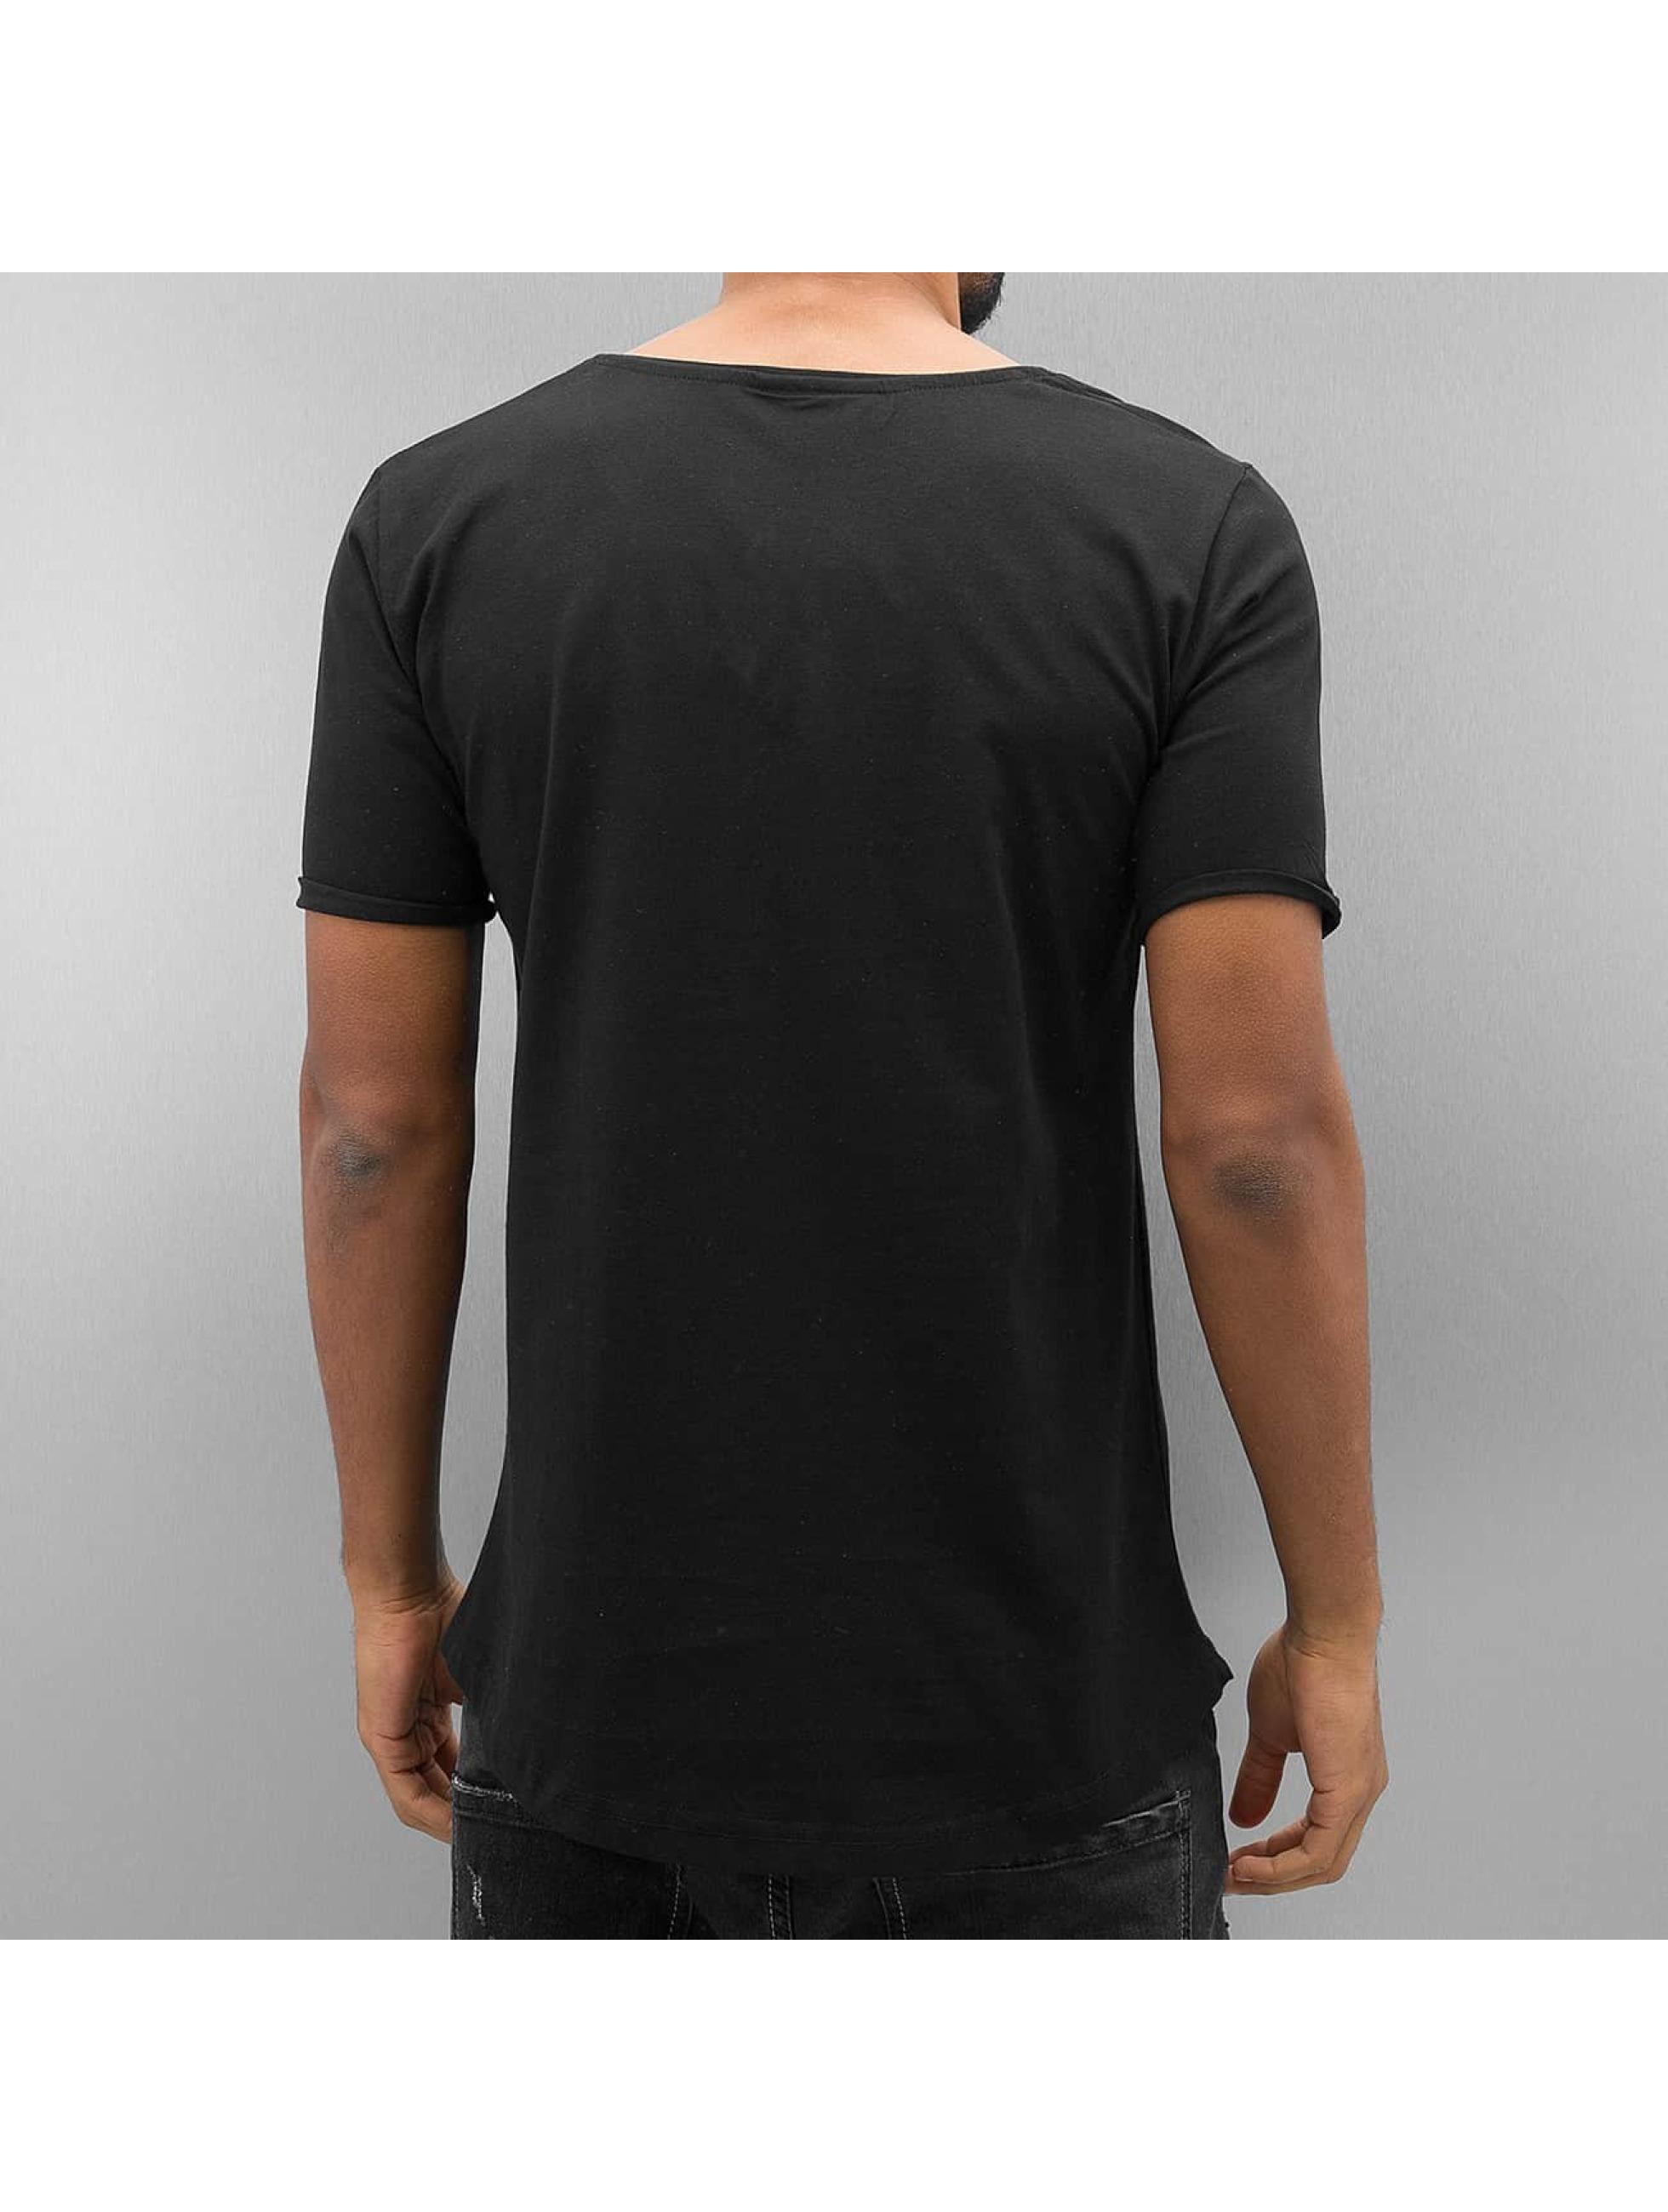 2Y T-Shirt Face schwarz